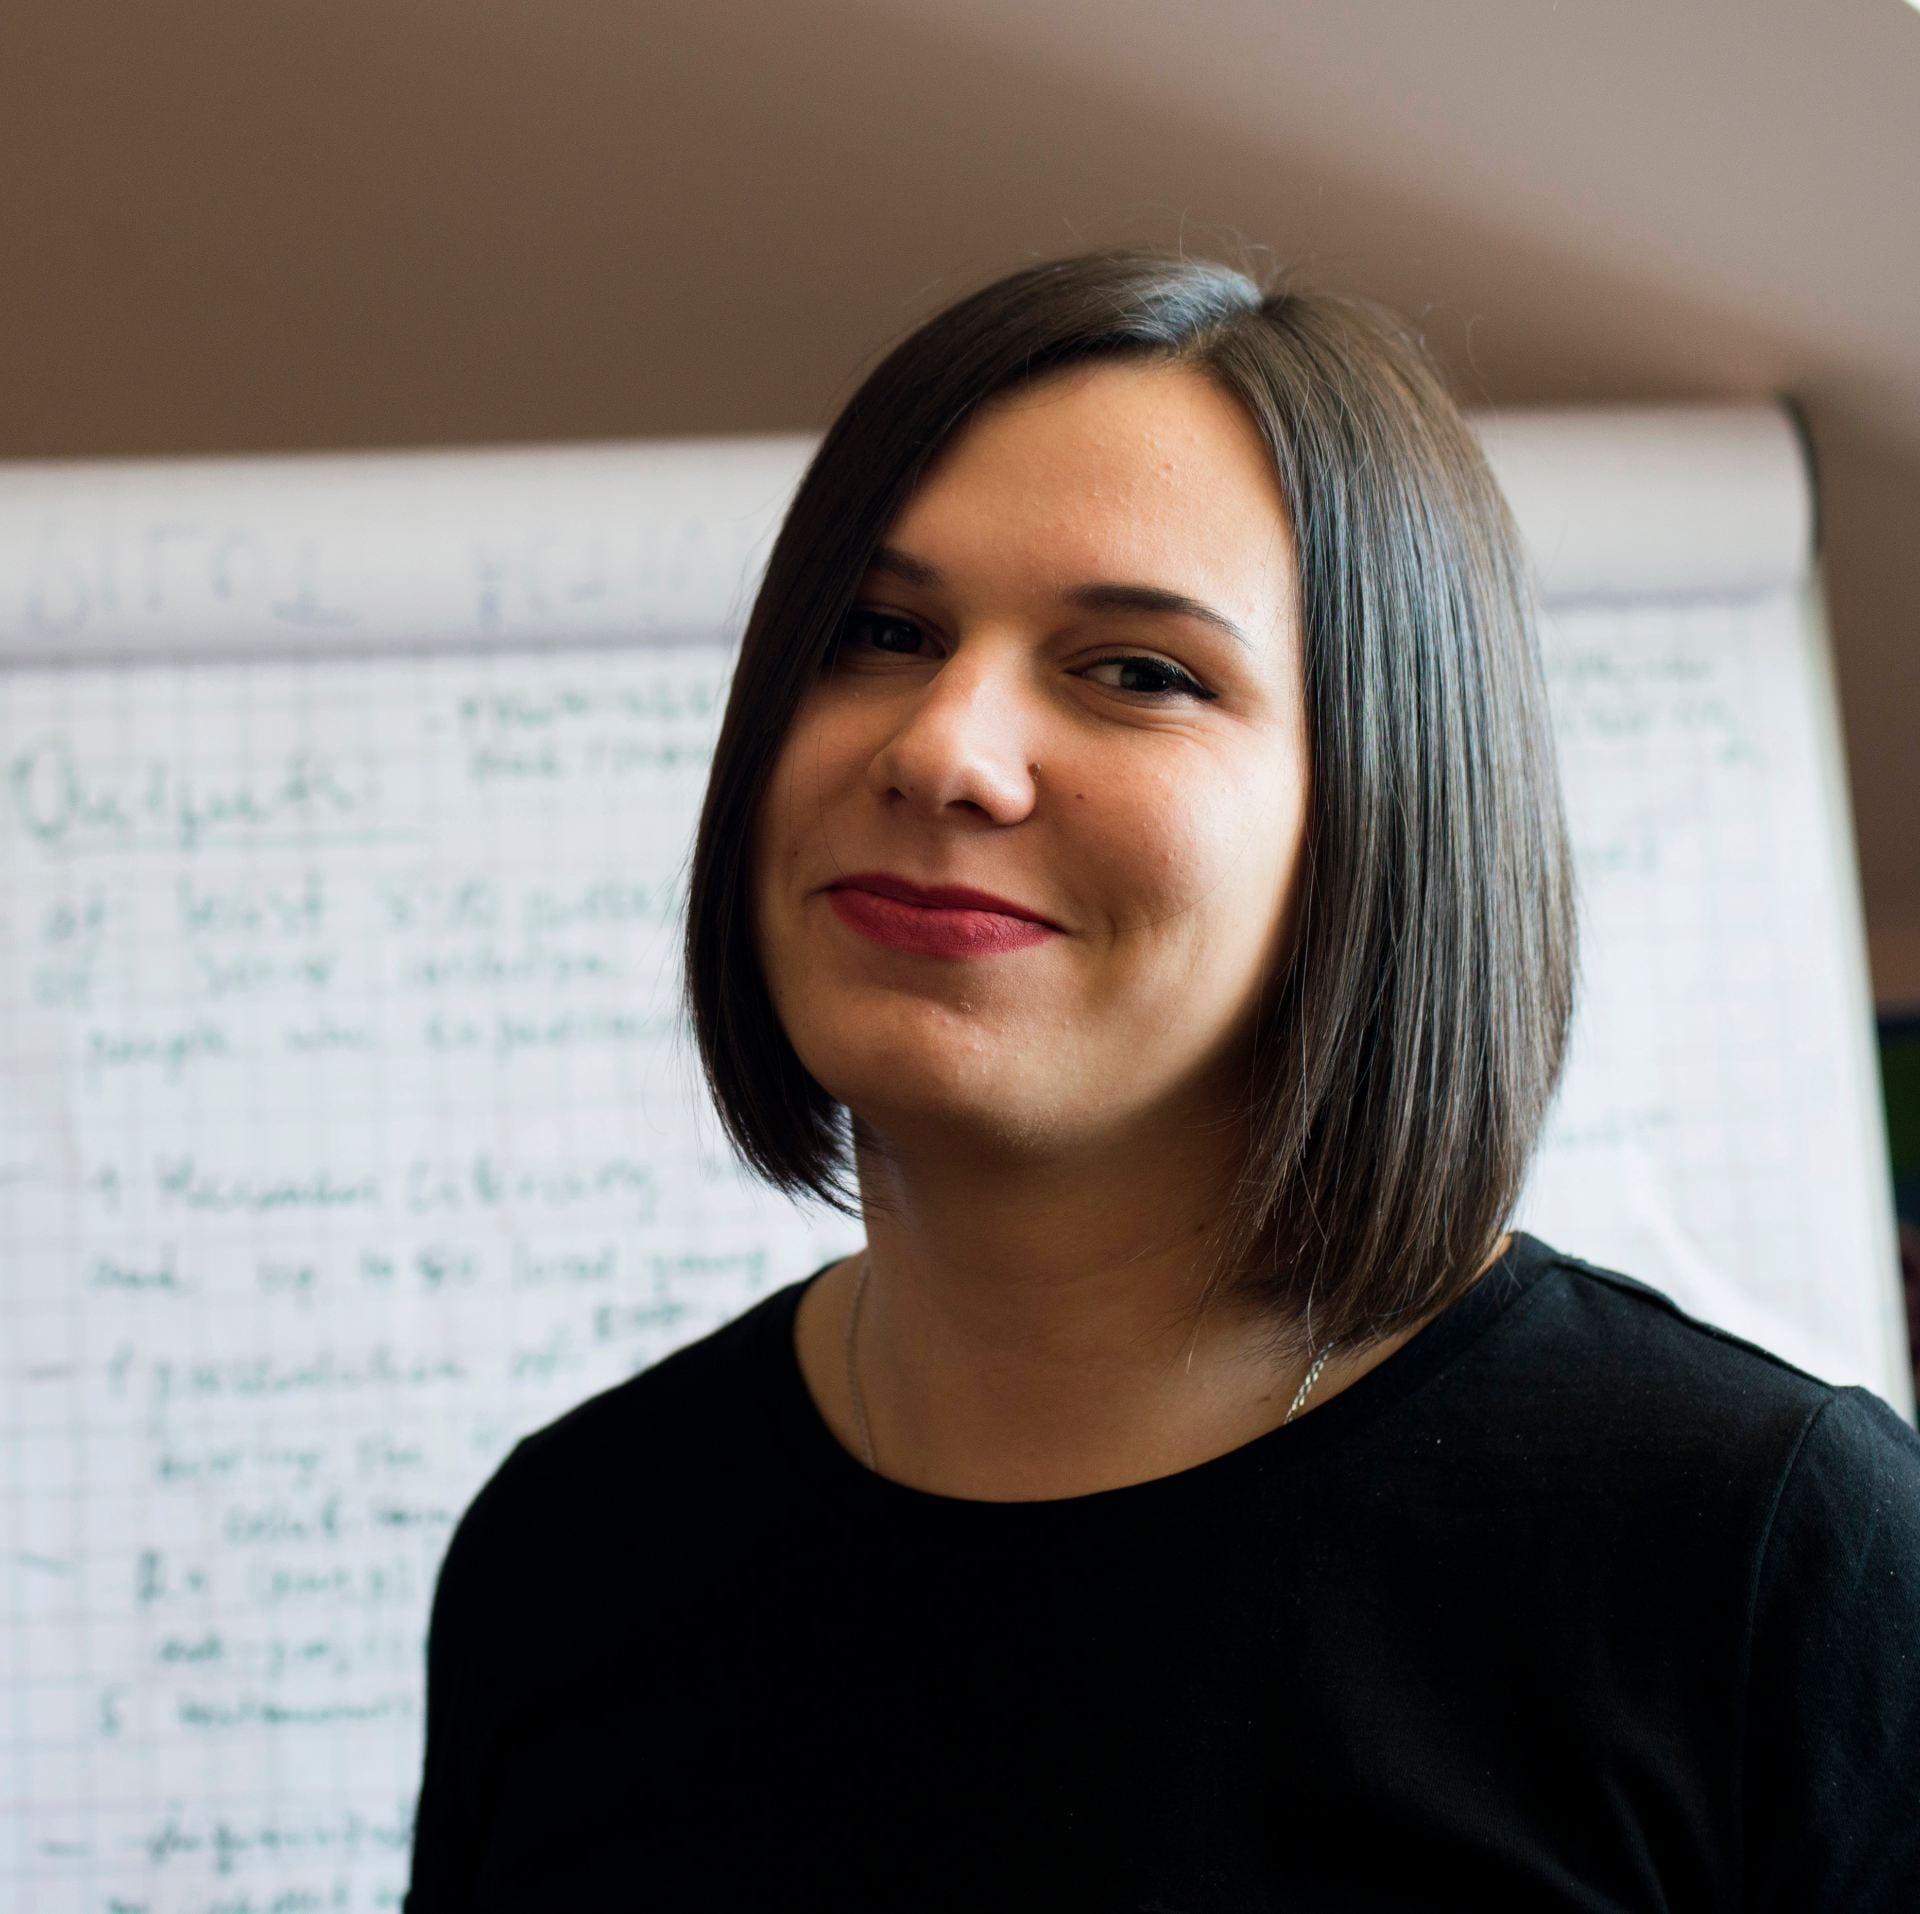 Anna Lepska